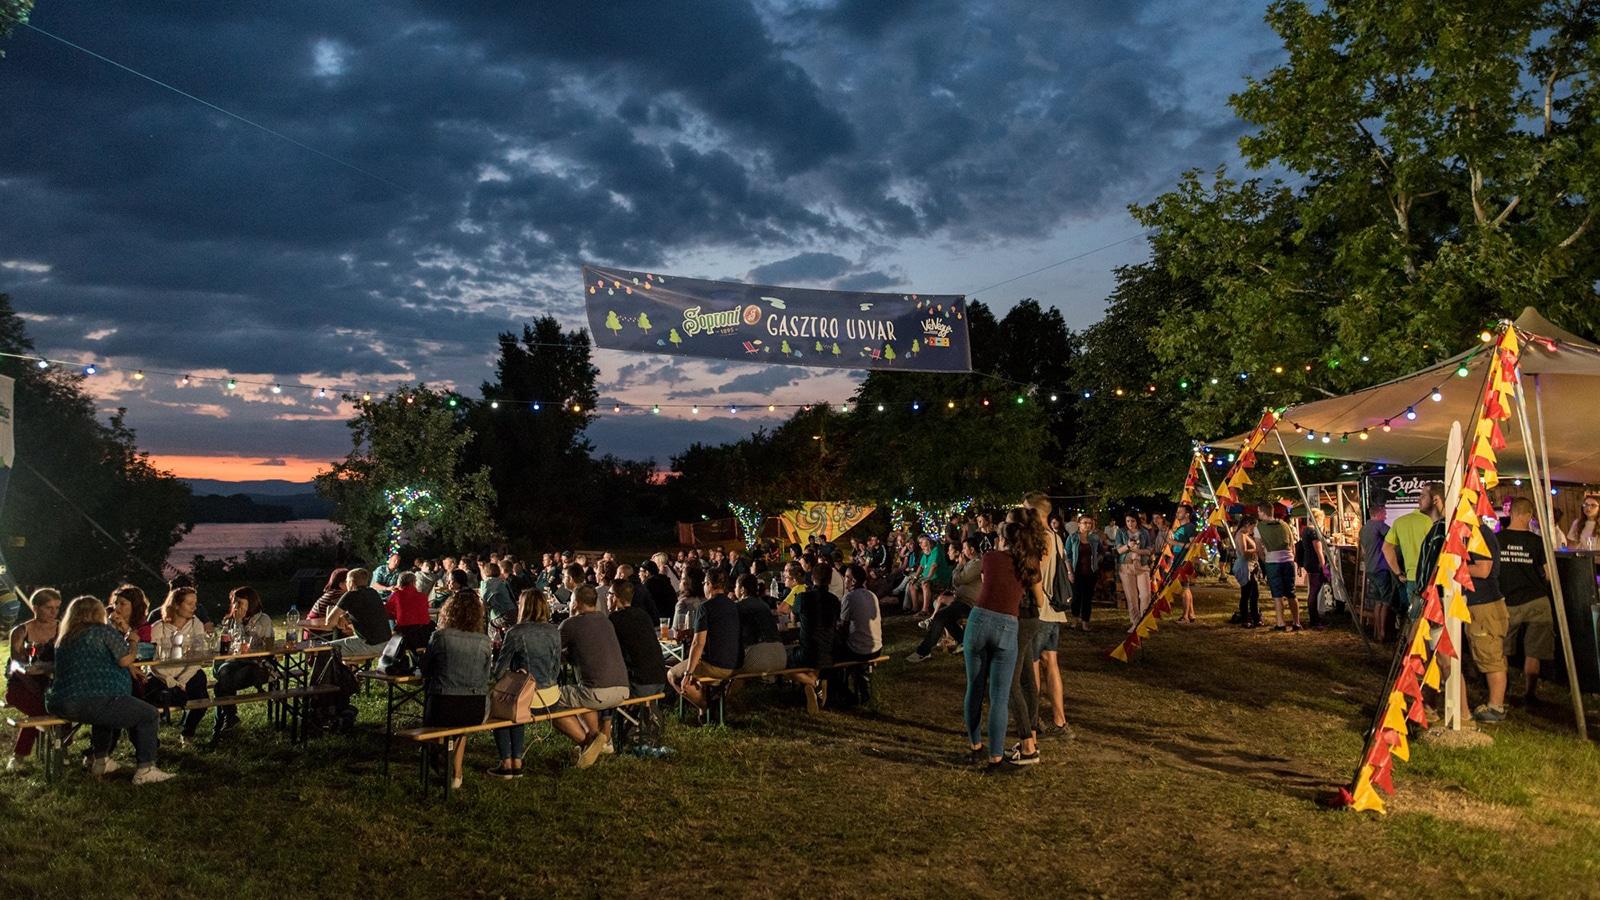 venegy fesztival 2021 halott penz punnany massif ruzsa magdi